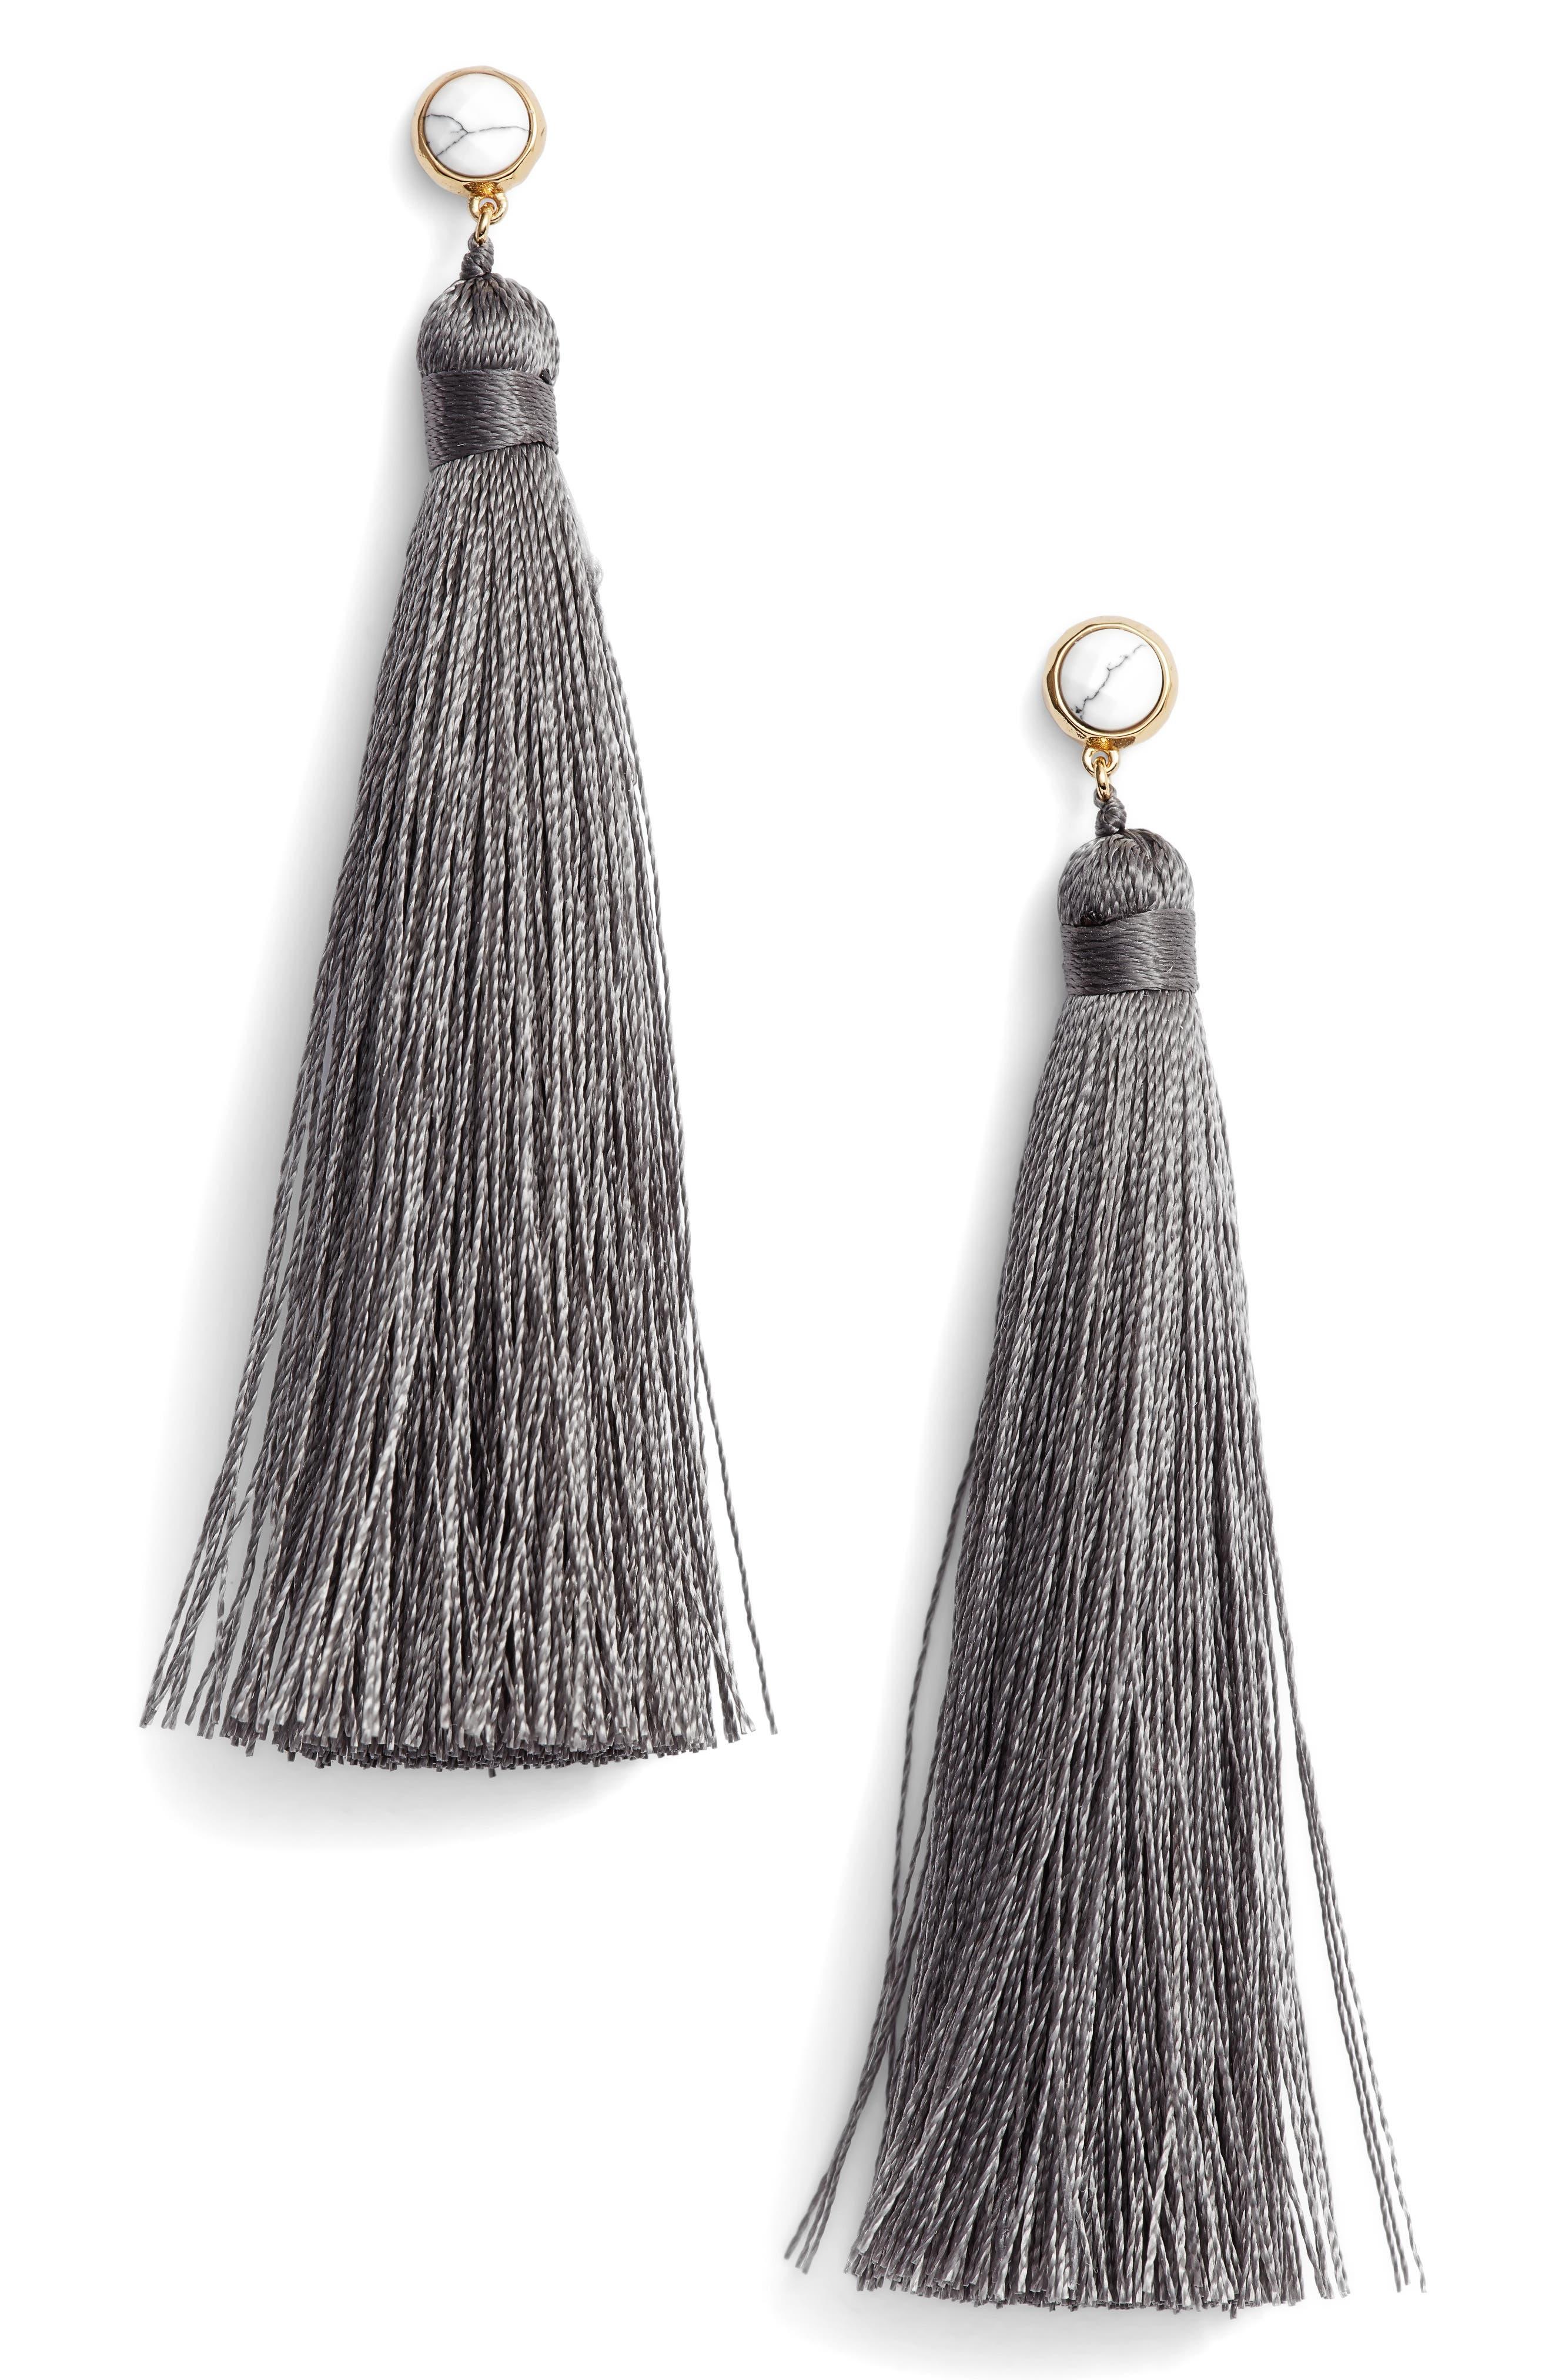 Tulum Tassel Earrings,                             Main thumbnail 1, color,                             020